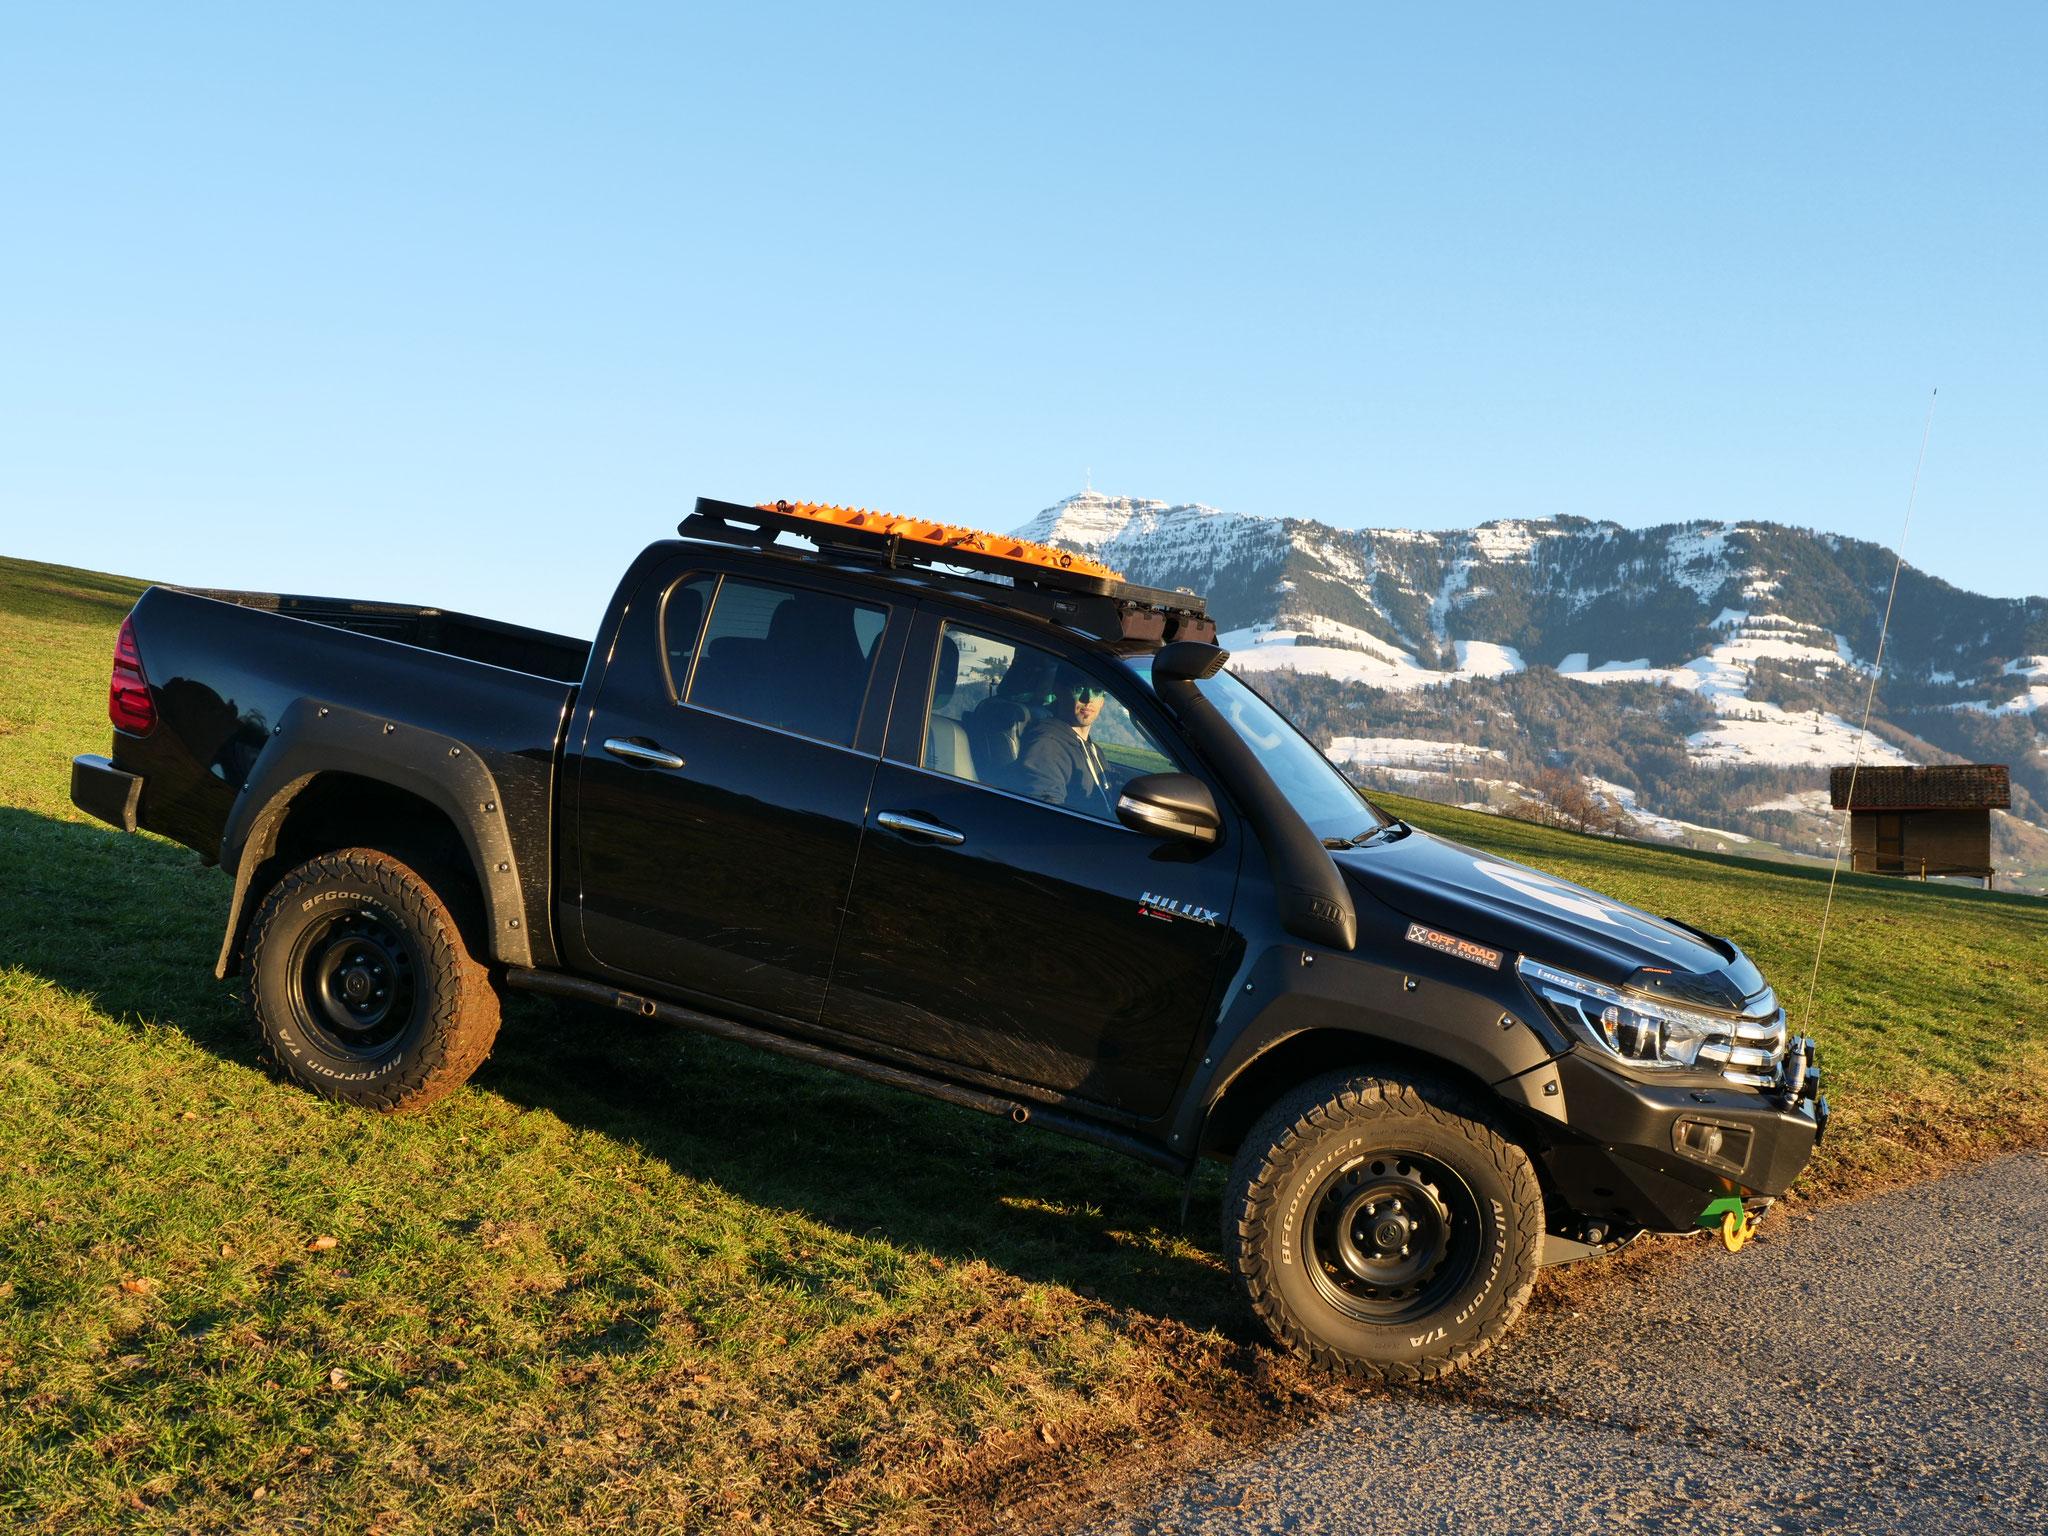 "Toyota Hilux Revo 2017 2.4 #ProjektBlackwolf Alu-cab offroad overland expedition 4x4 ARB Fahrwerk Frontrunner Rocksliders Roofrack Rival skidplate  bfgoodrich 285/70R17 33"" Tires TJM Sknorkel wolf78-overland.ch"